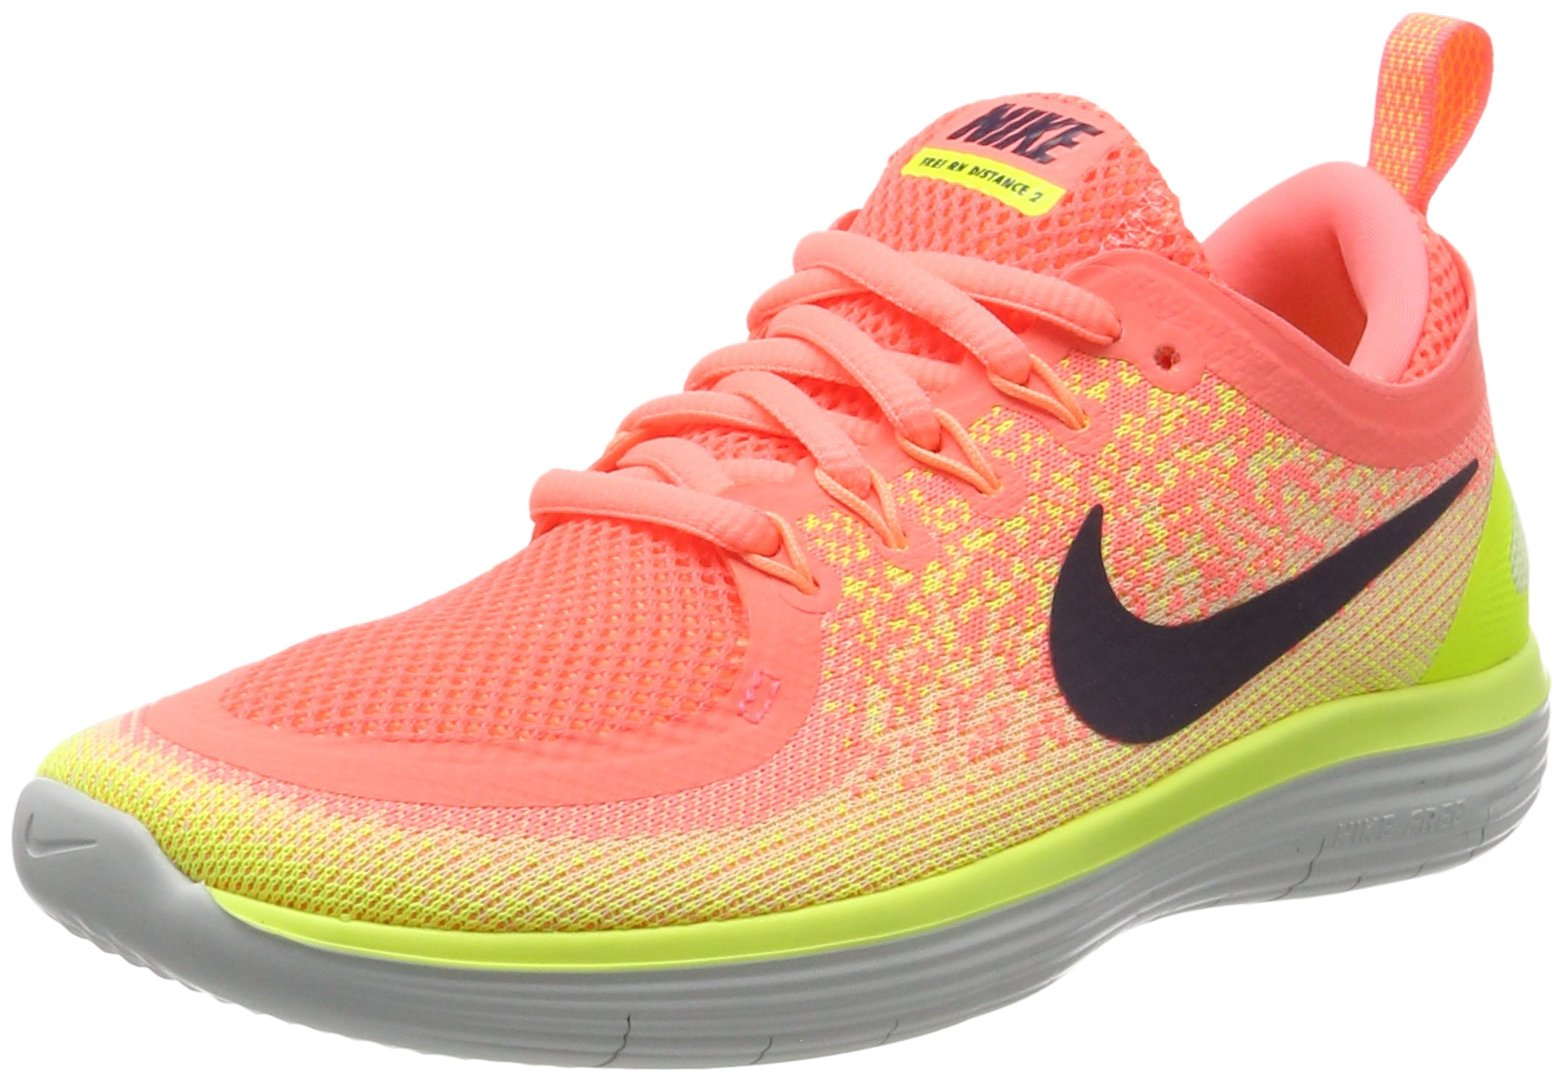 huge discount 5e3ba 8e3c9 Galleon - Nike Womens Free Rn Distance 2 Running Shoe  (Lava-Glow DarkRaisin, 7.5)